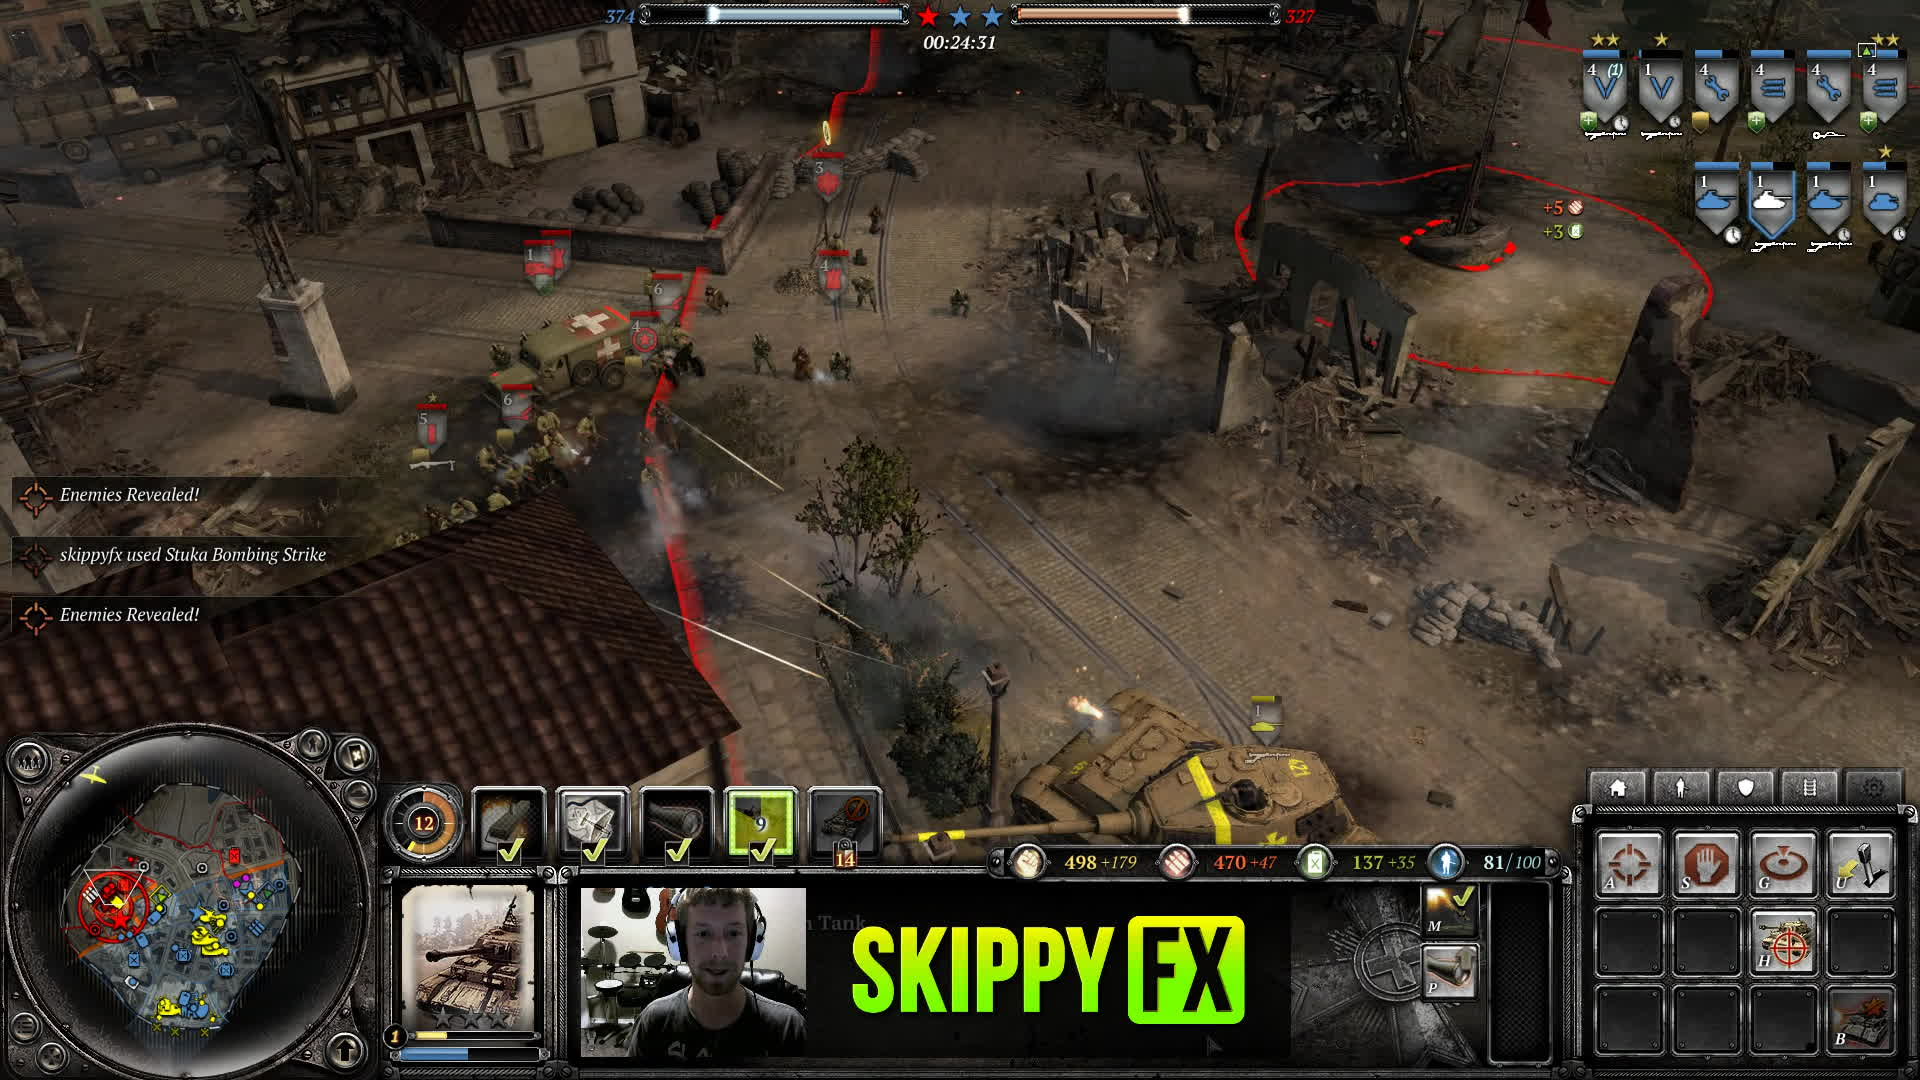 coh2, companyofheroes, stuka bomb, CoH2: Stuka Bomb from Hell GIFs